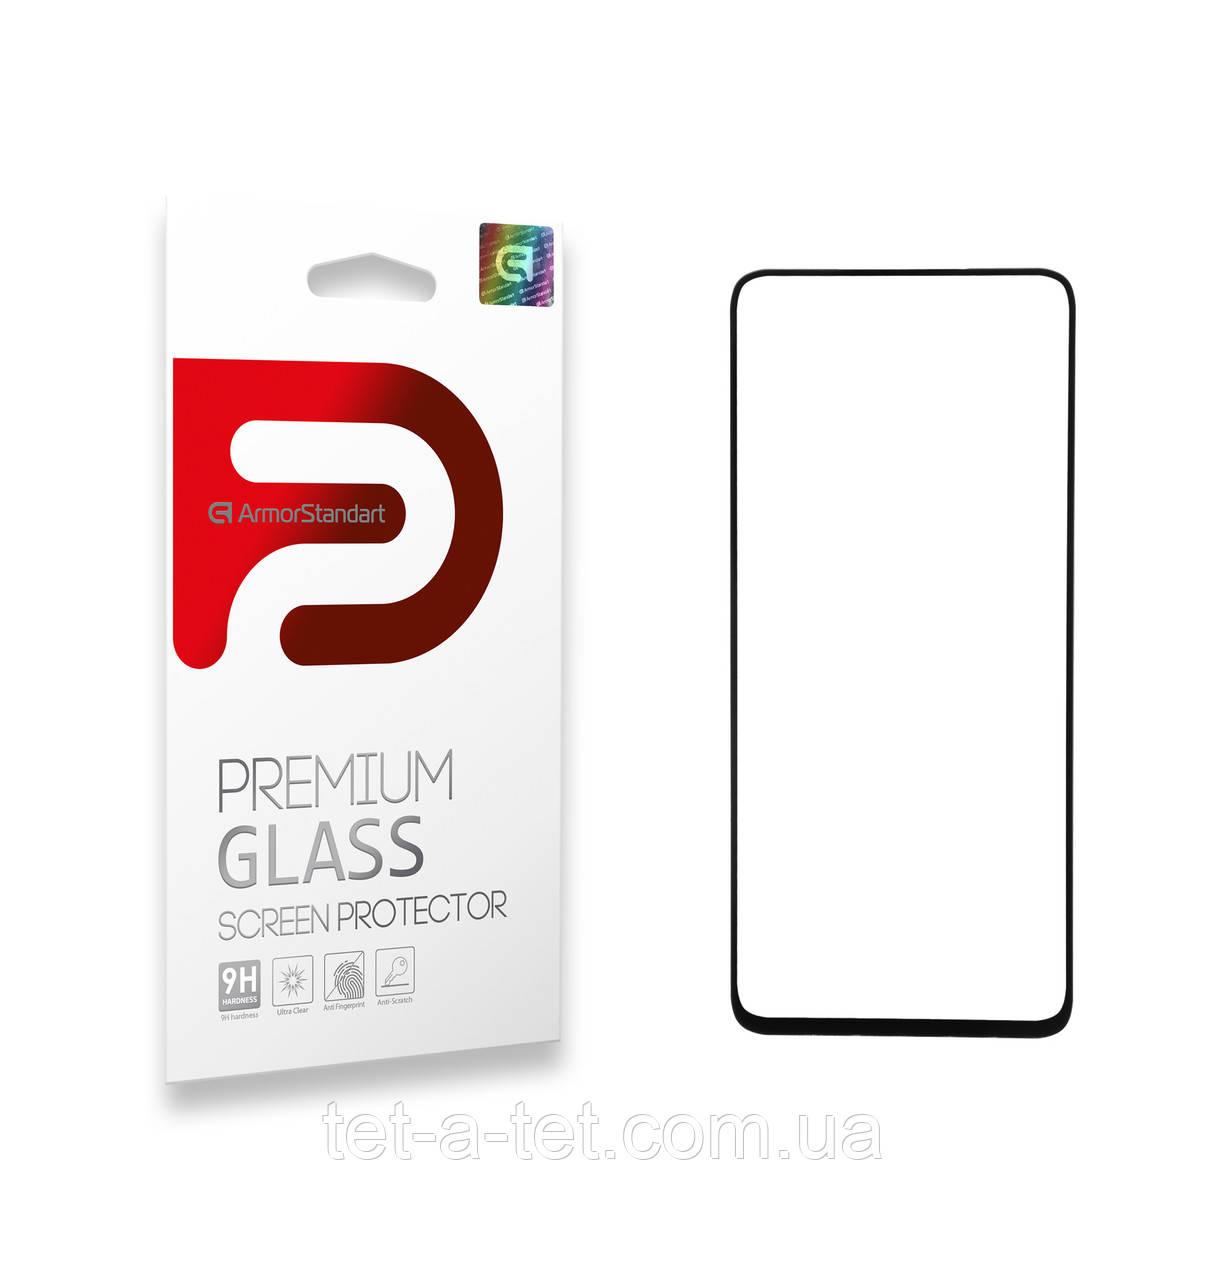 Защитное стекло Armorstandart Full Glue для TECNO Spark 5 Pro (KD7) Black (premium glass)